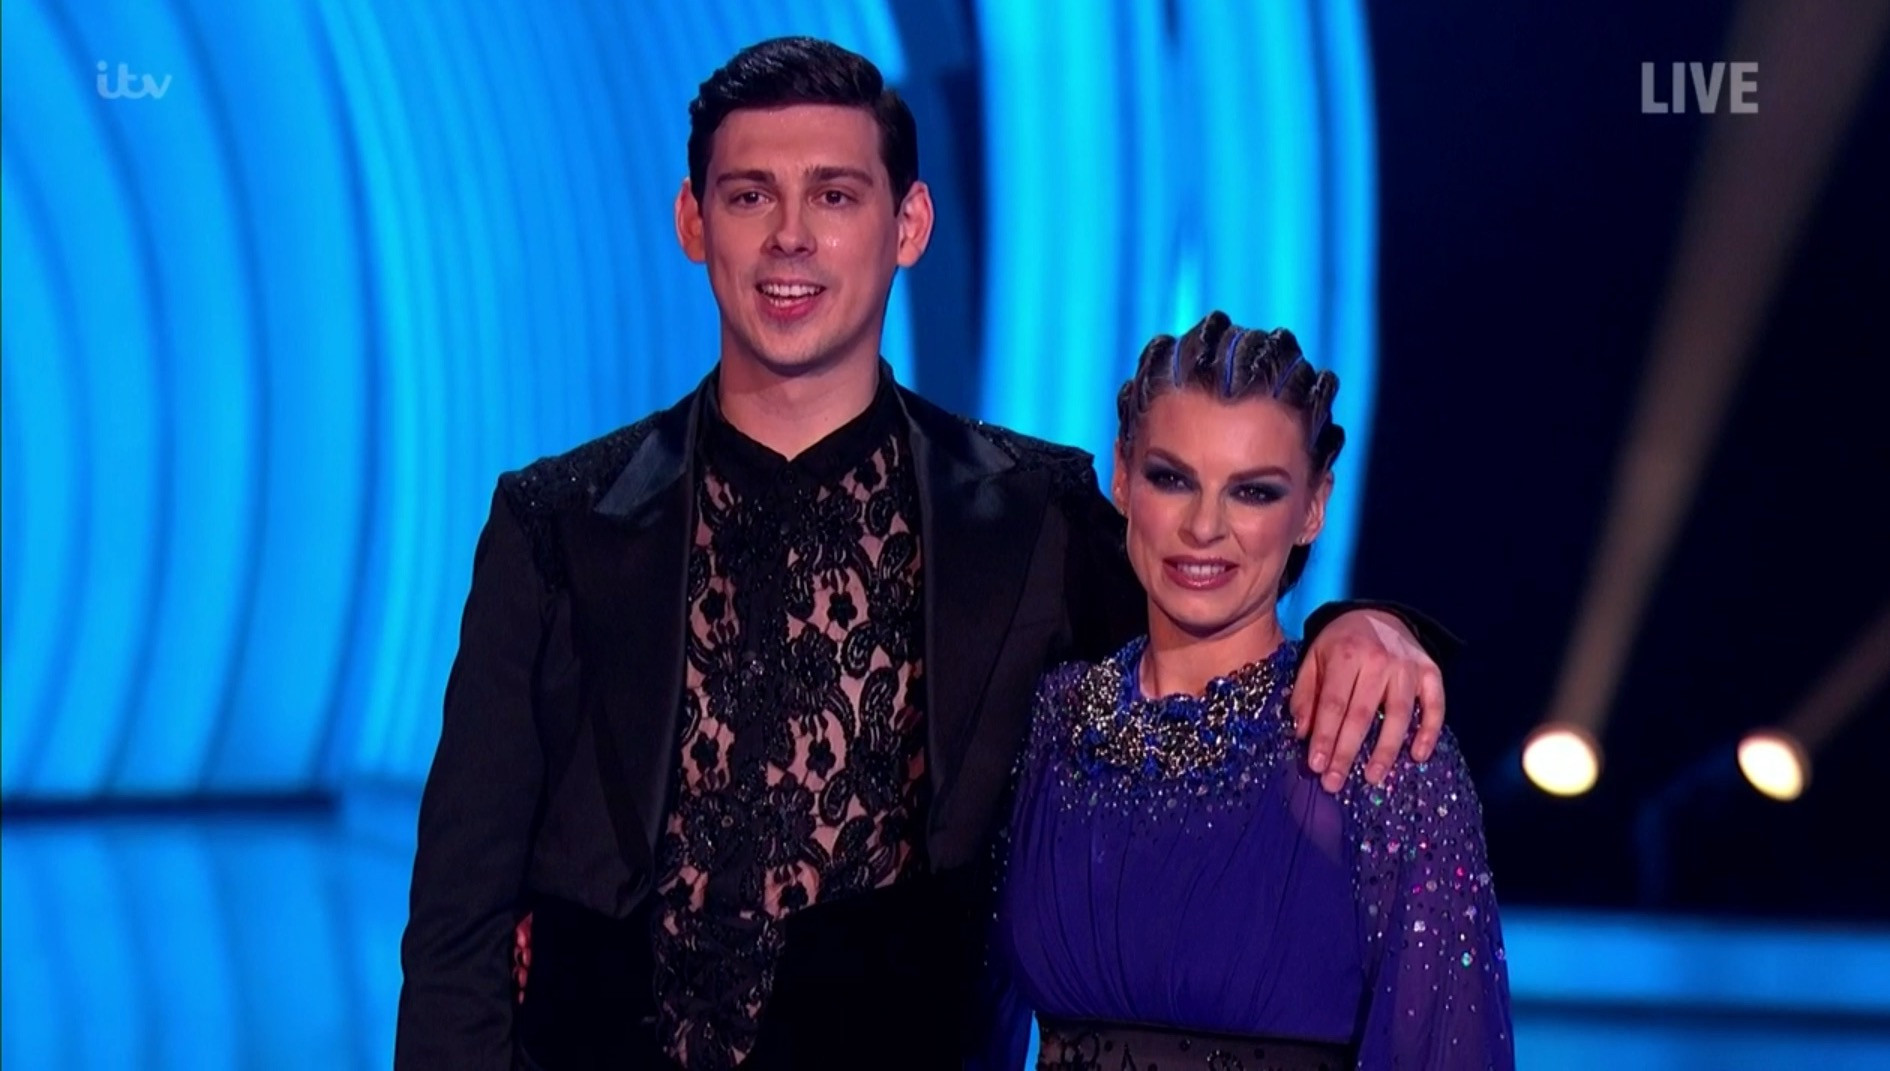 Dancing On Ice 2021: Viewers blast 'unfair' elimination of Matt Richardson after one week